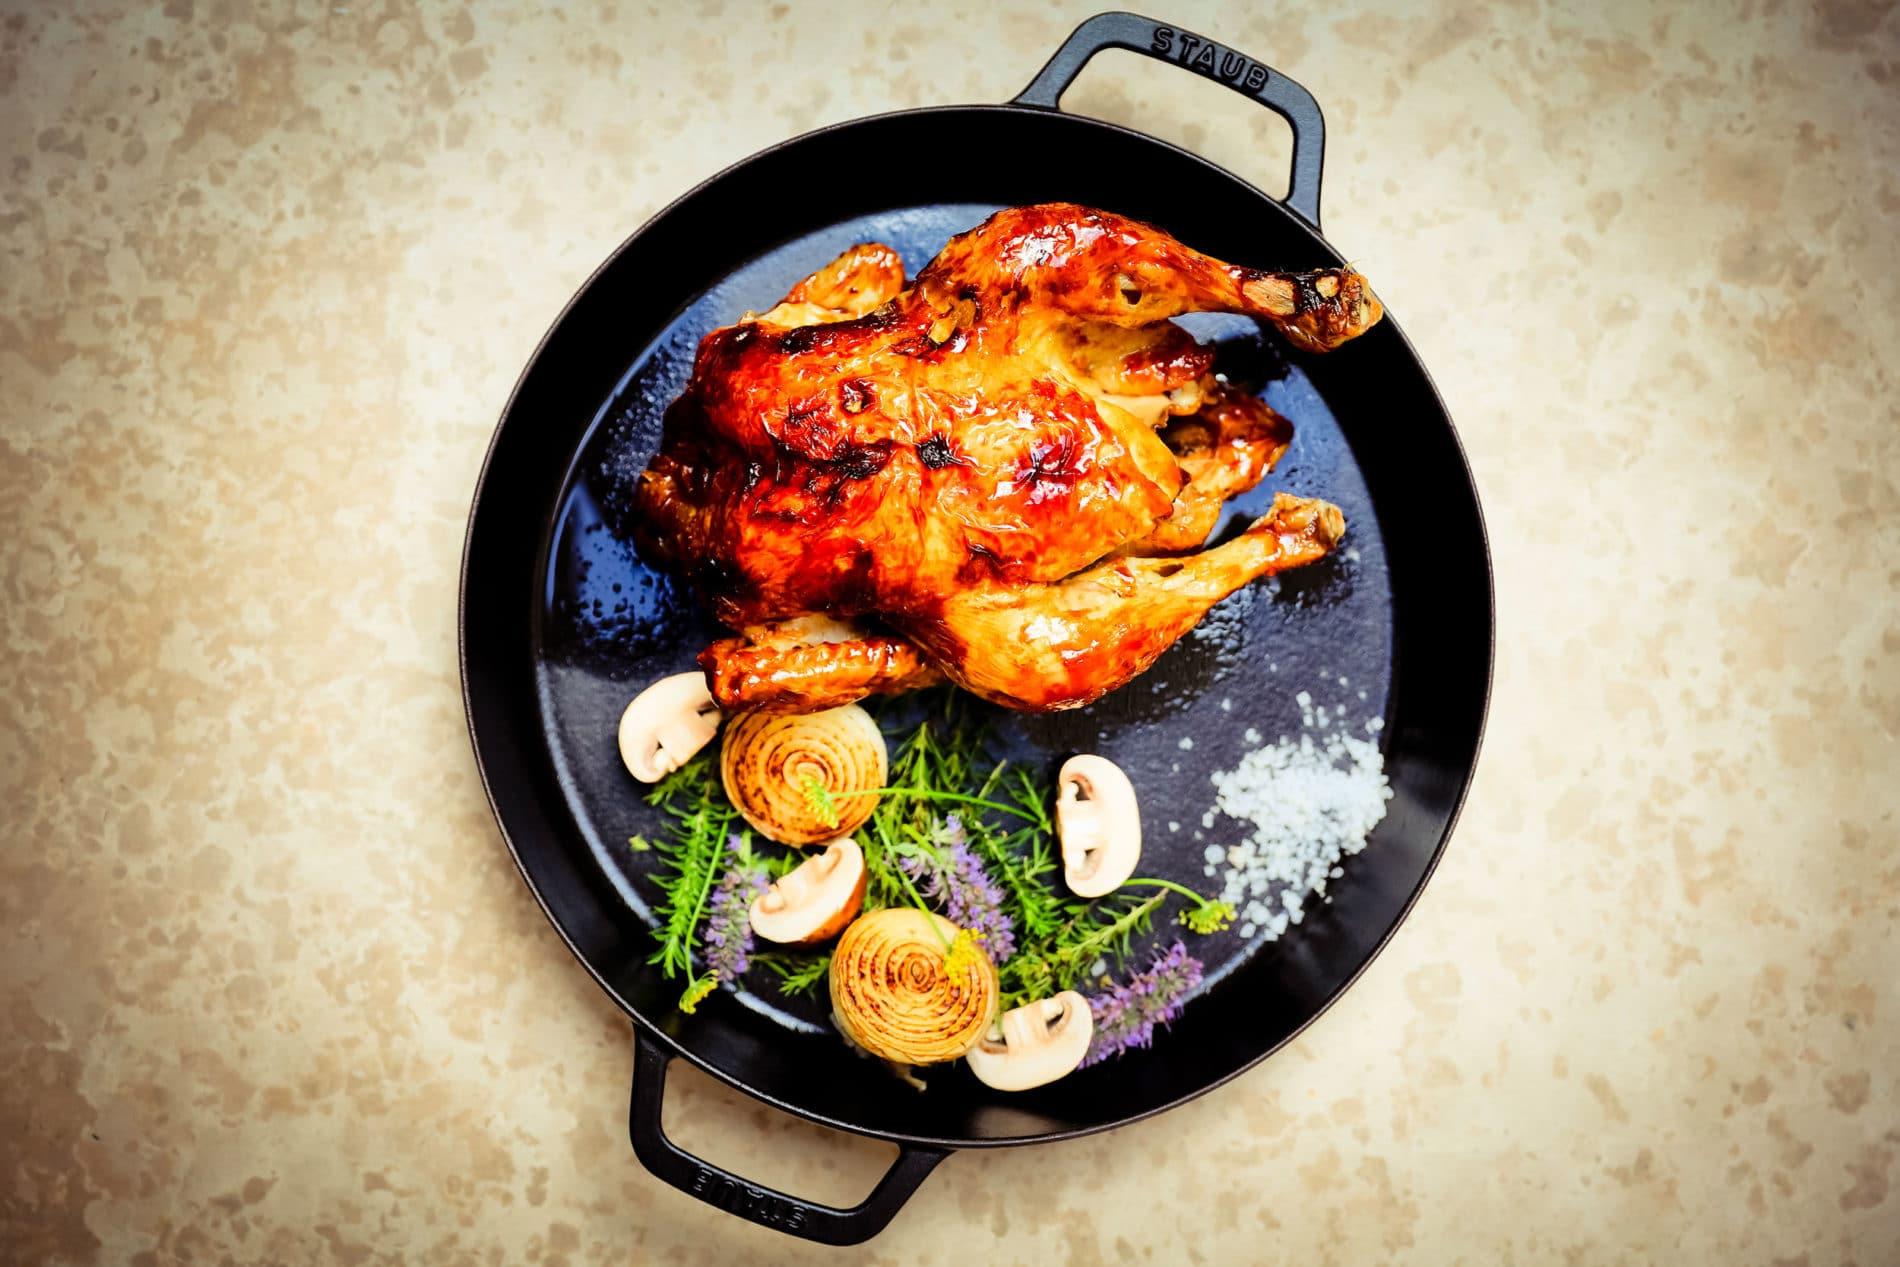 Pless-poulet